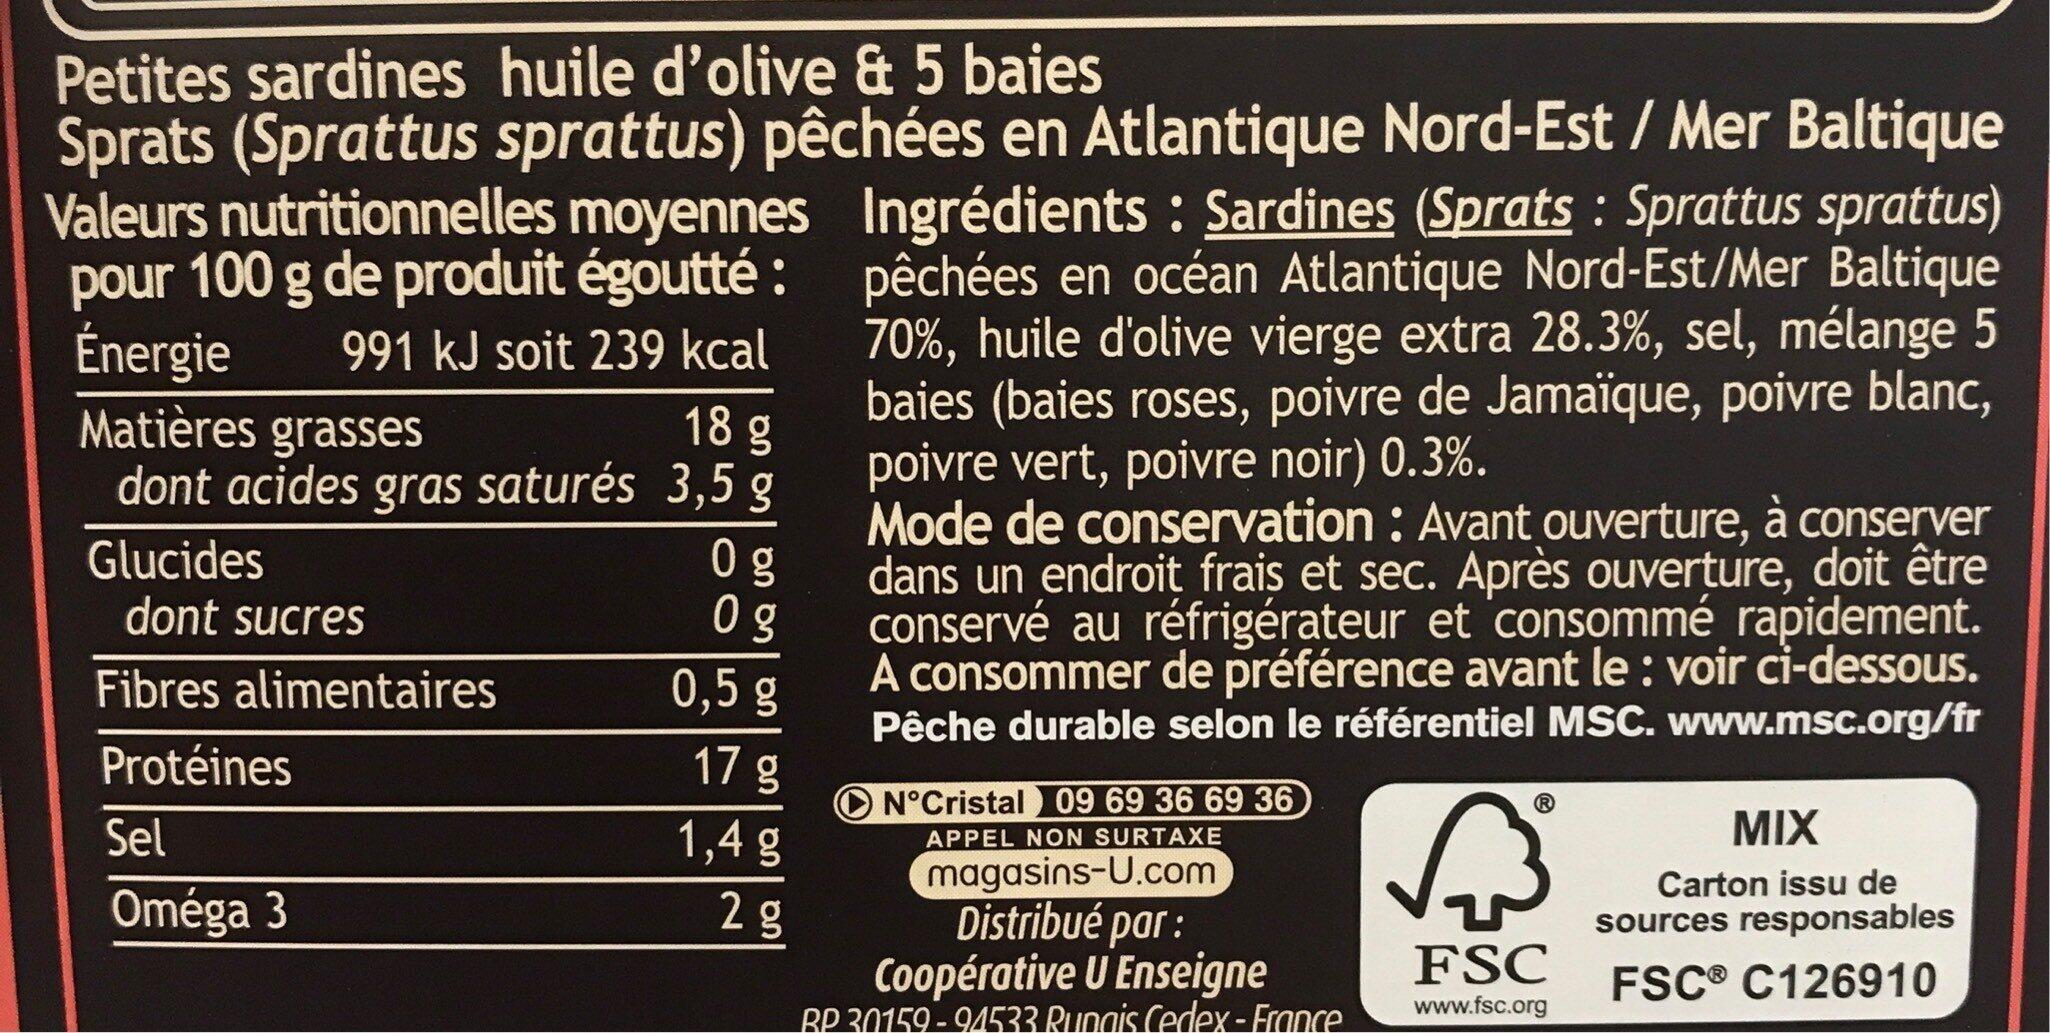 Mini sardines 5 baies huile olive - Informations nutritionnelles - fr